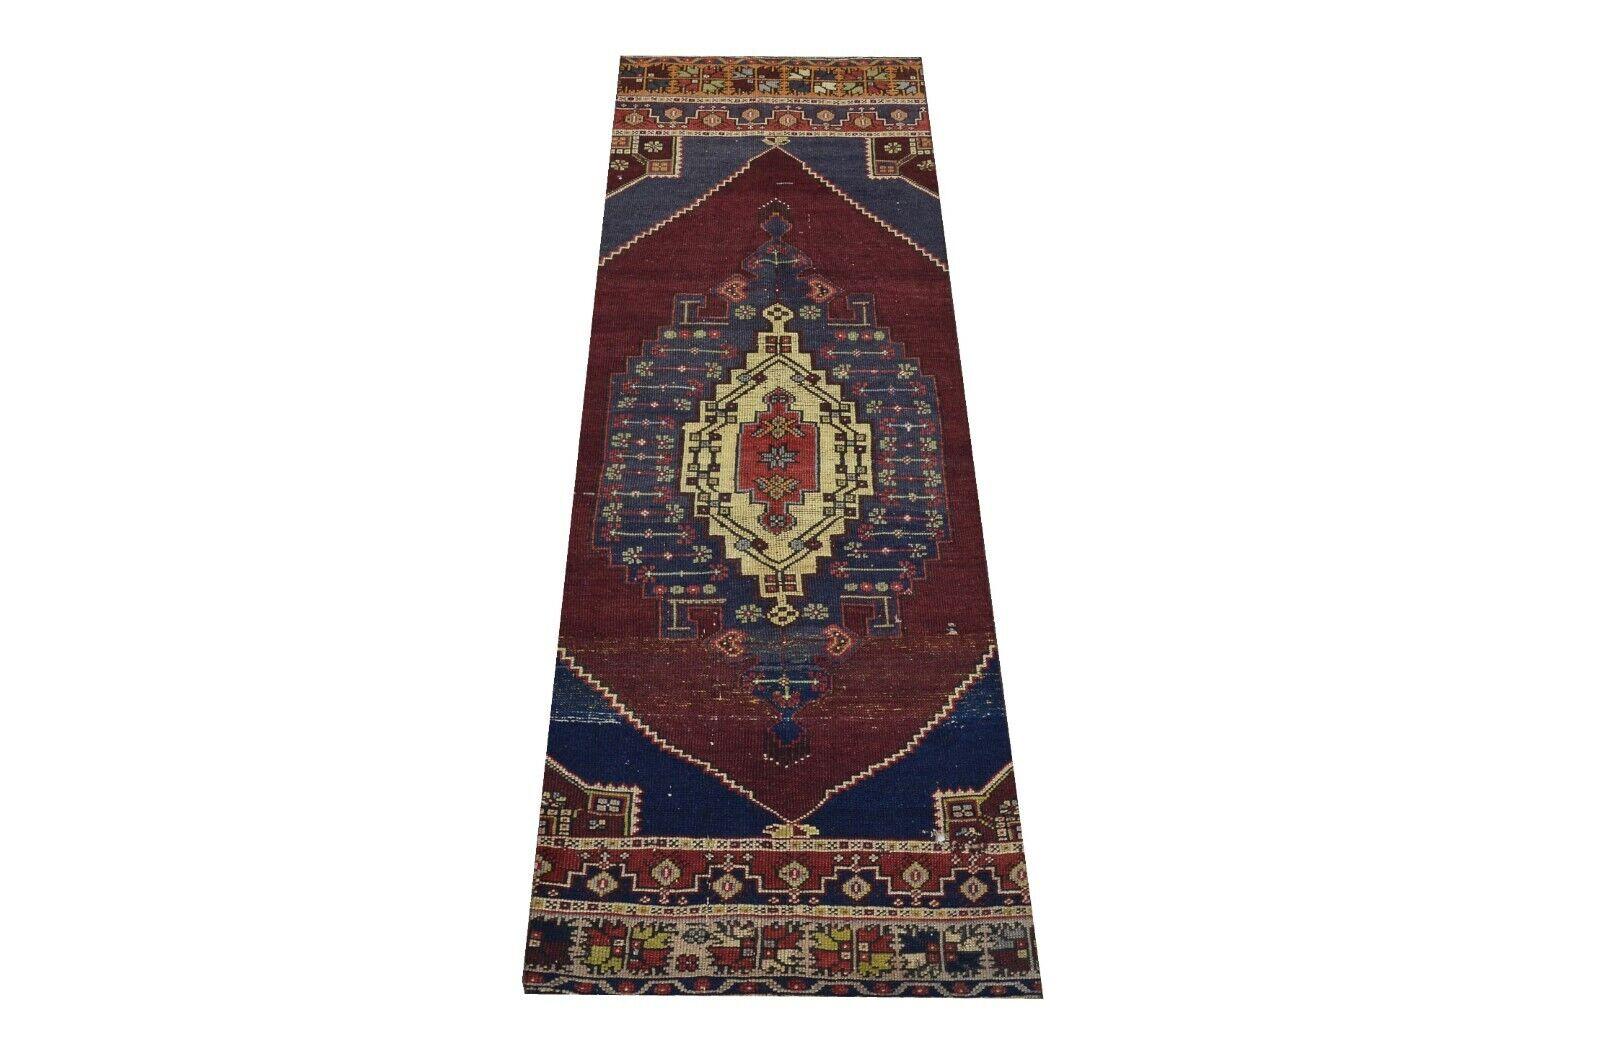 Turkish Runner Rug, Navy blu, Handmade Runner Rug, Turkish rug, Runner rug long